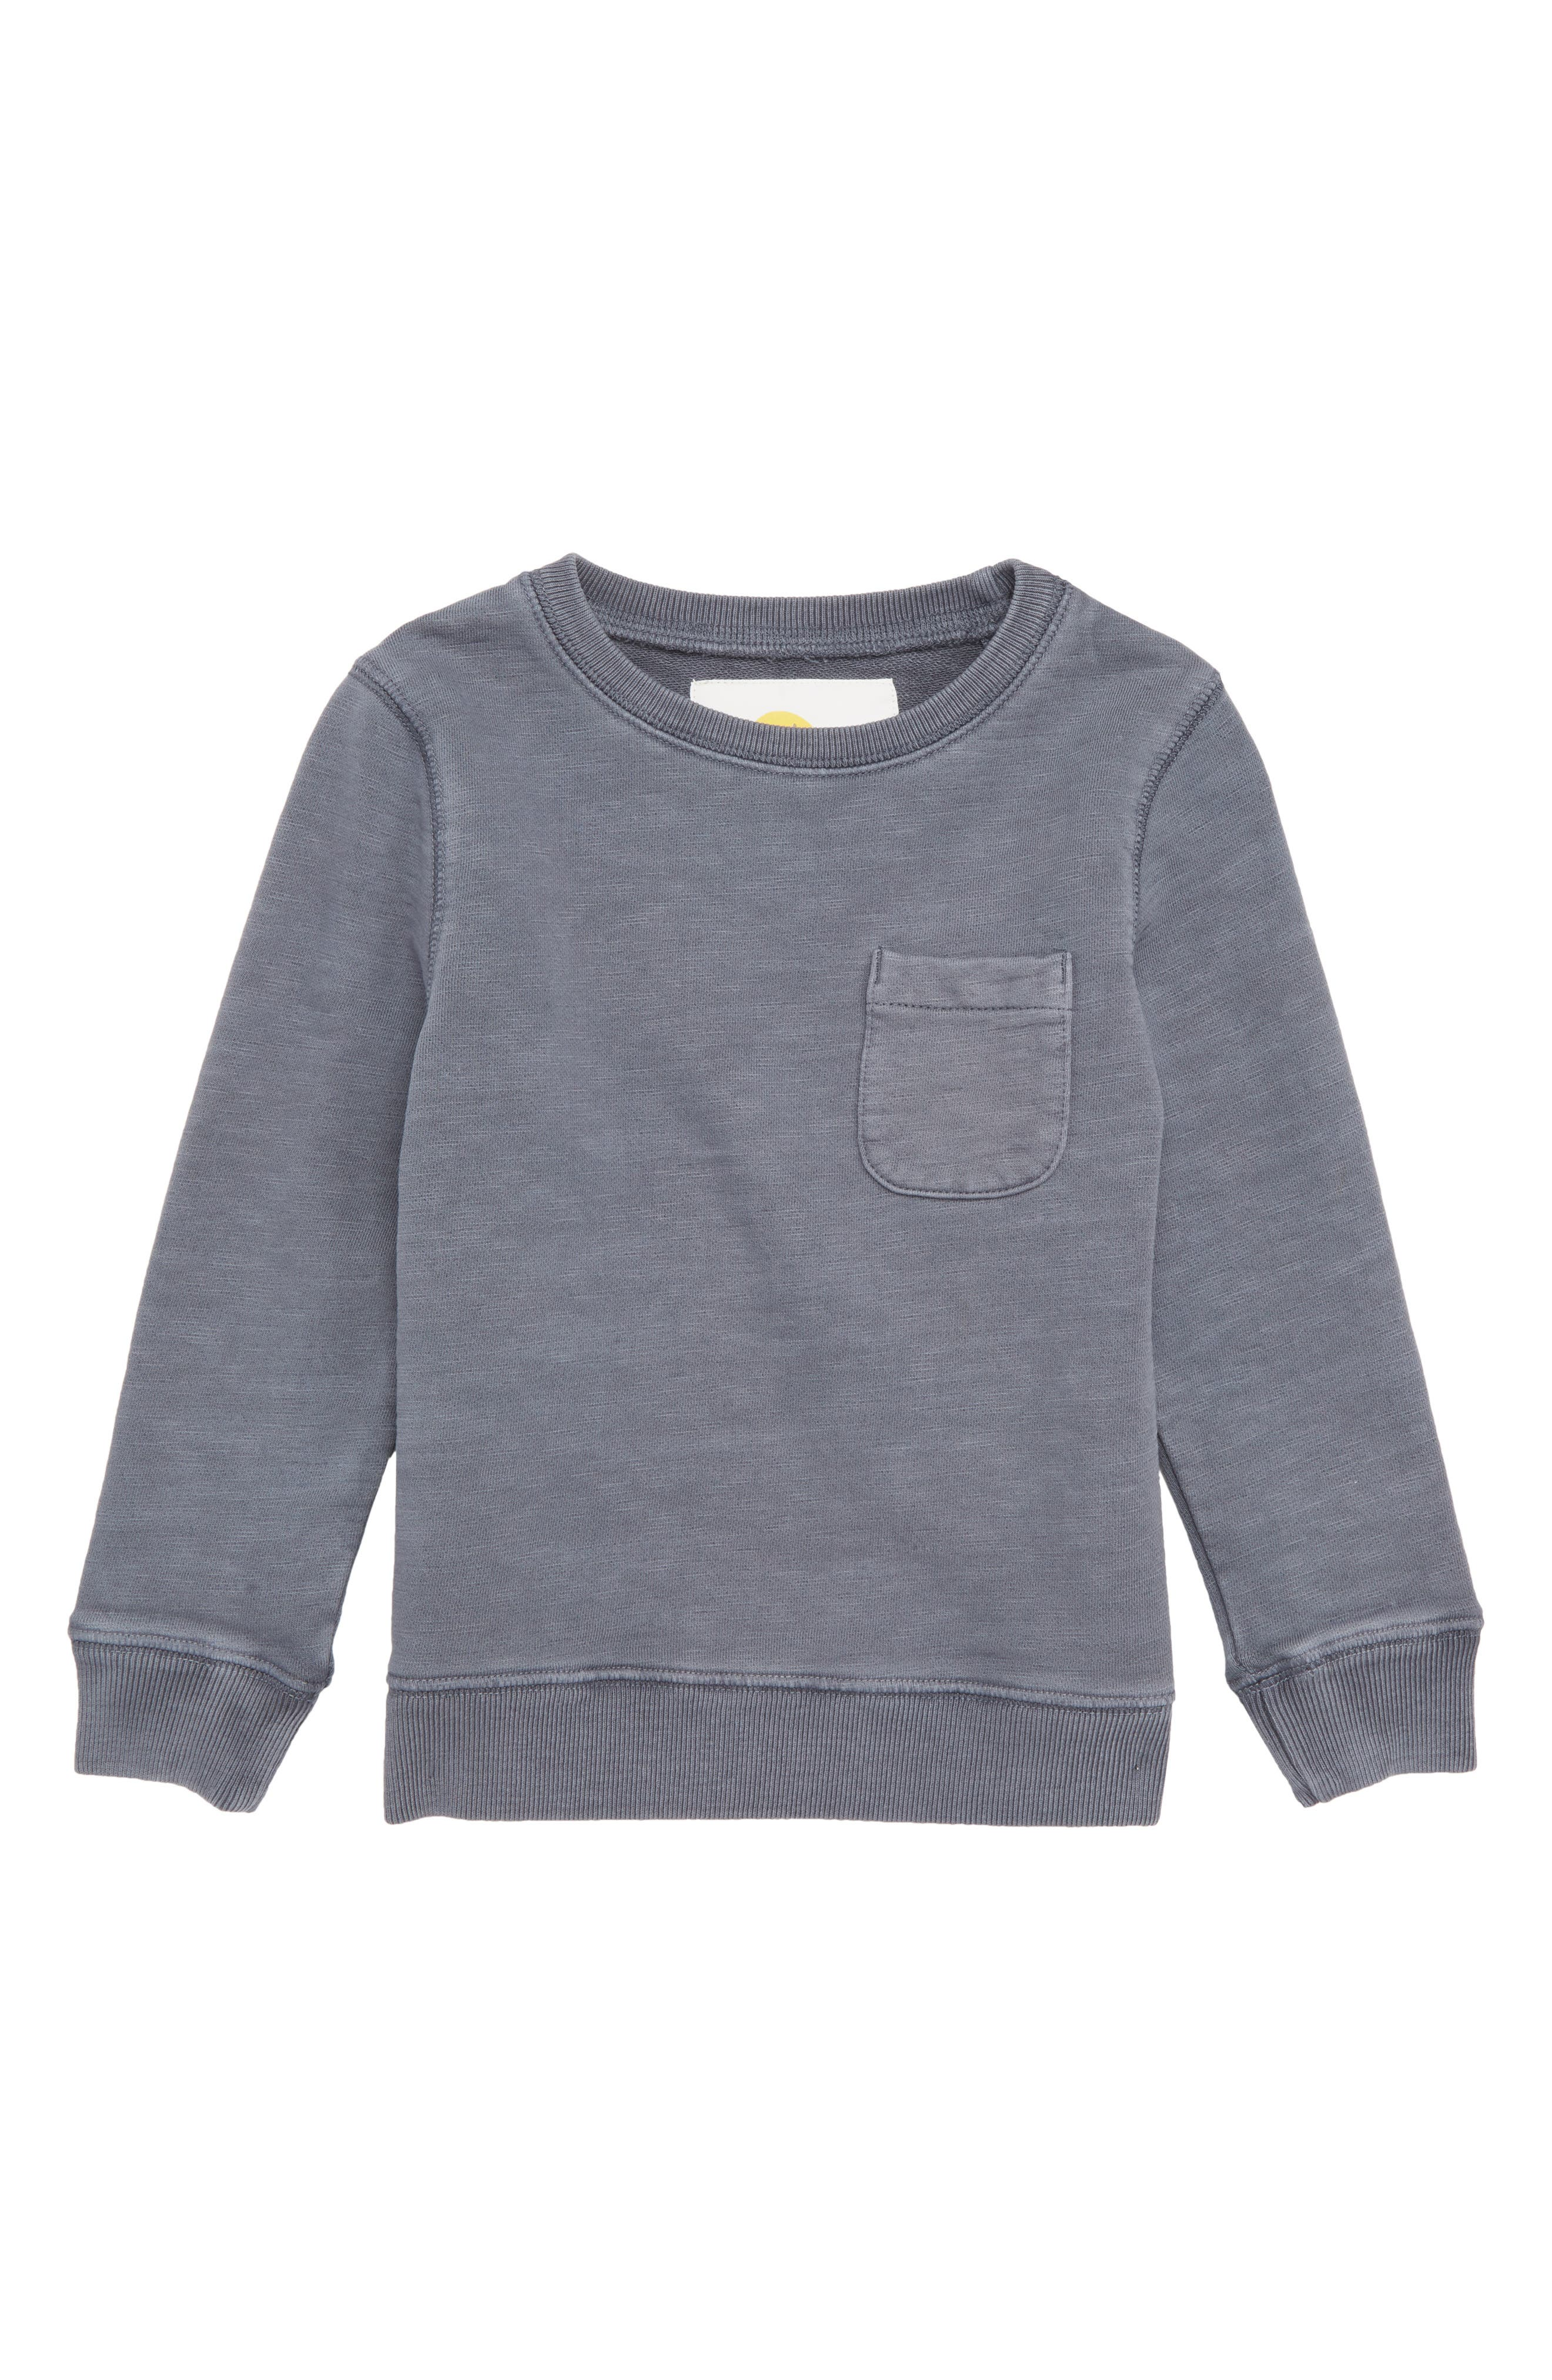 MINI BODEN Pocket Crewneck Sweatshirt, Main, color, 062